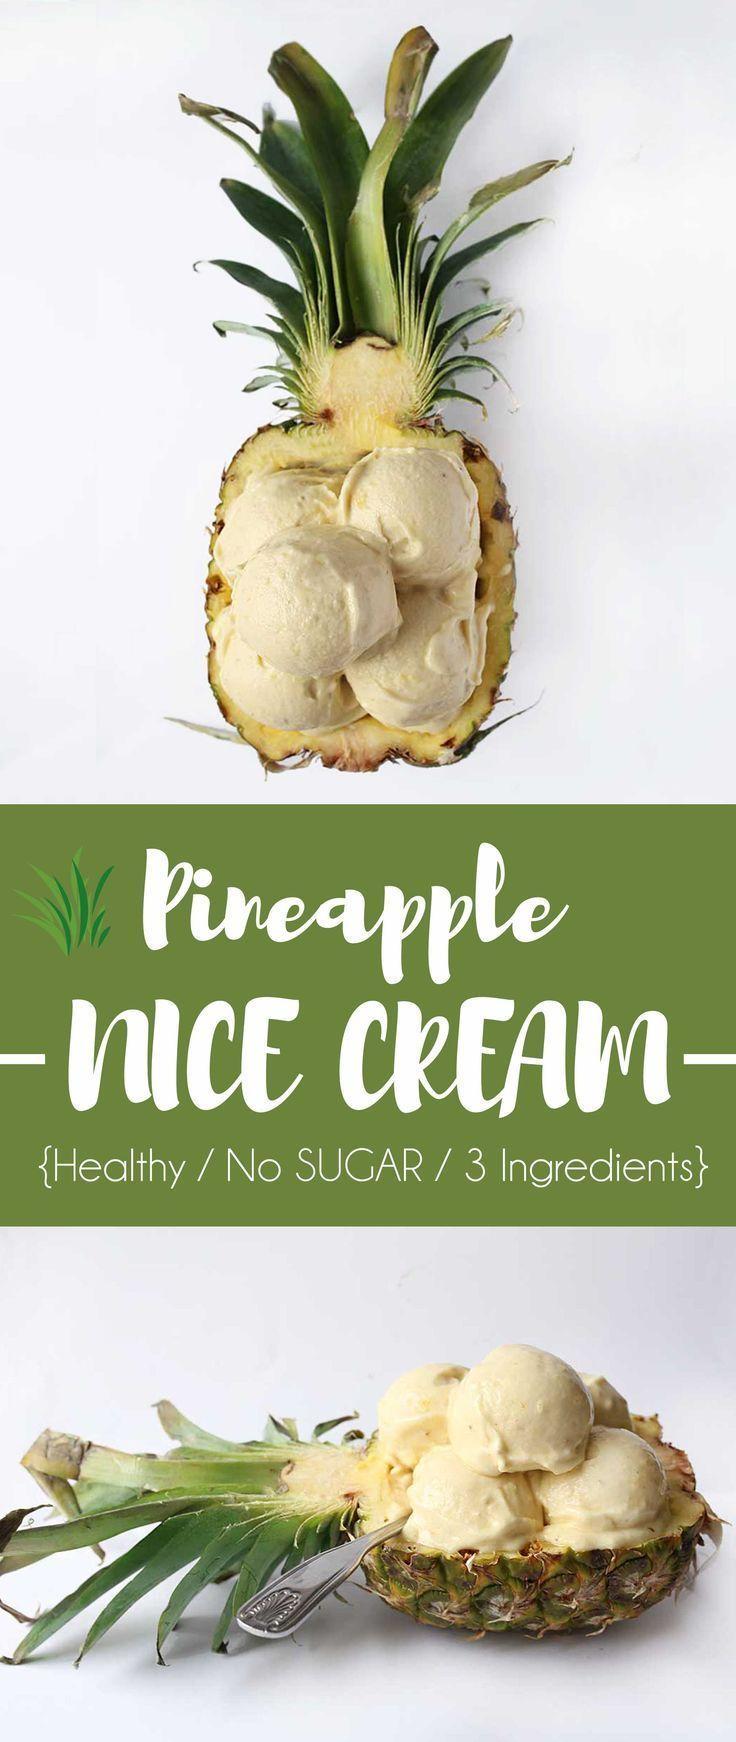 Healthy 3 Ingredient Pineapple Banana Icecream - Vegan, No AddedSugar